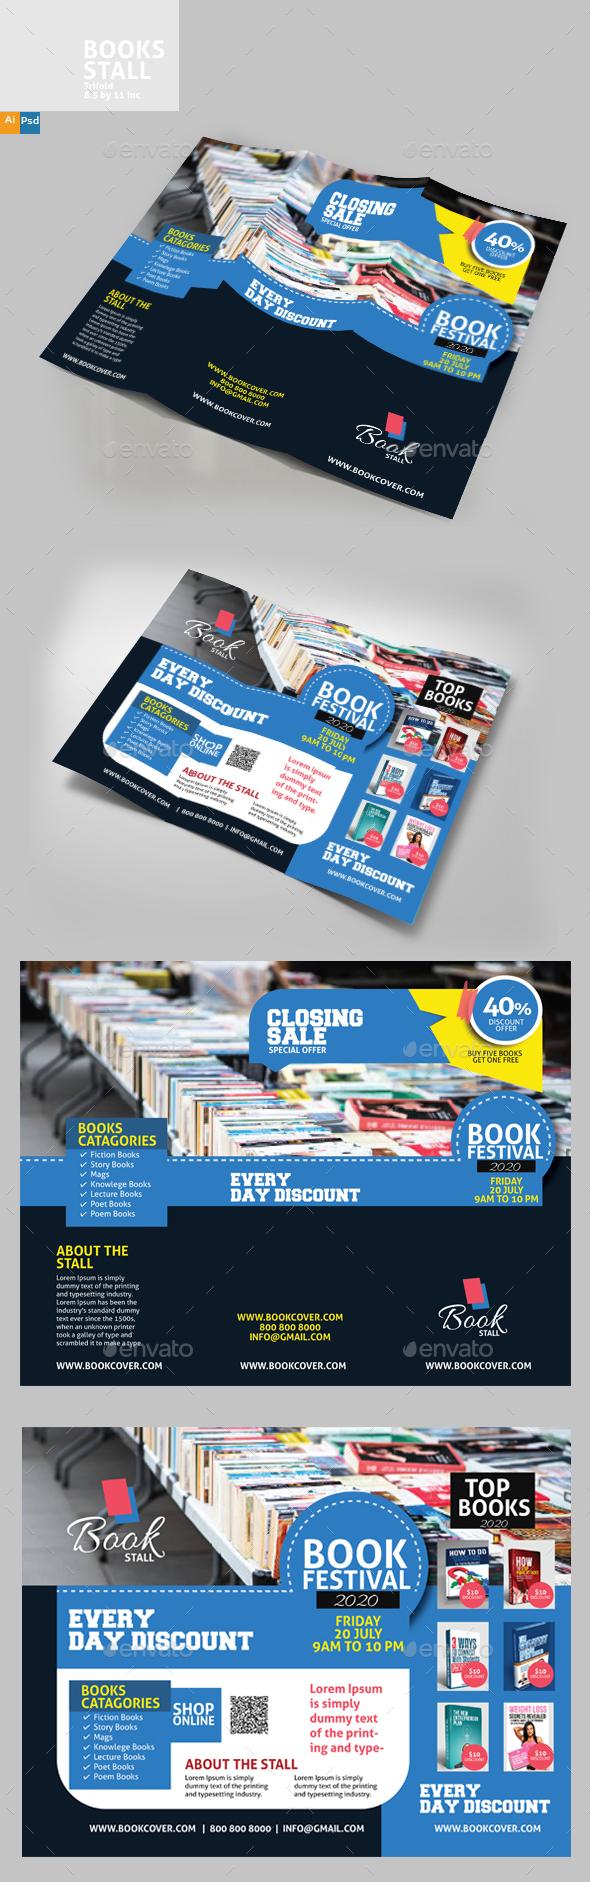 GraphicRiver Book Stall Brochure 20293315